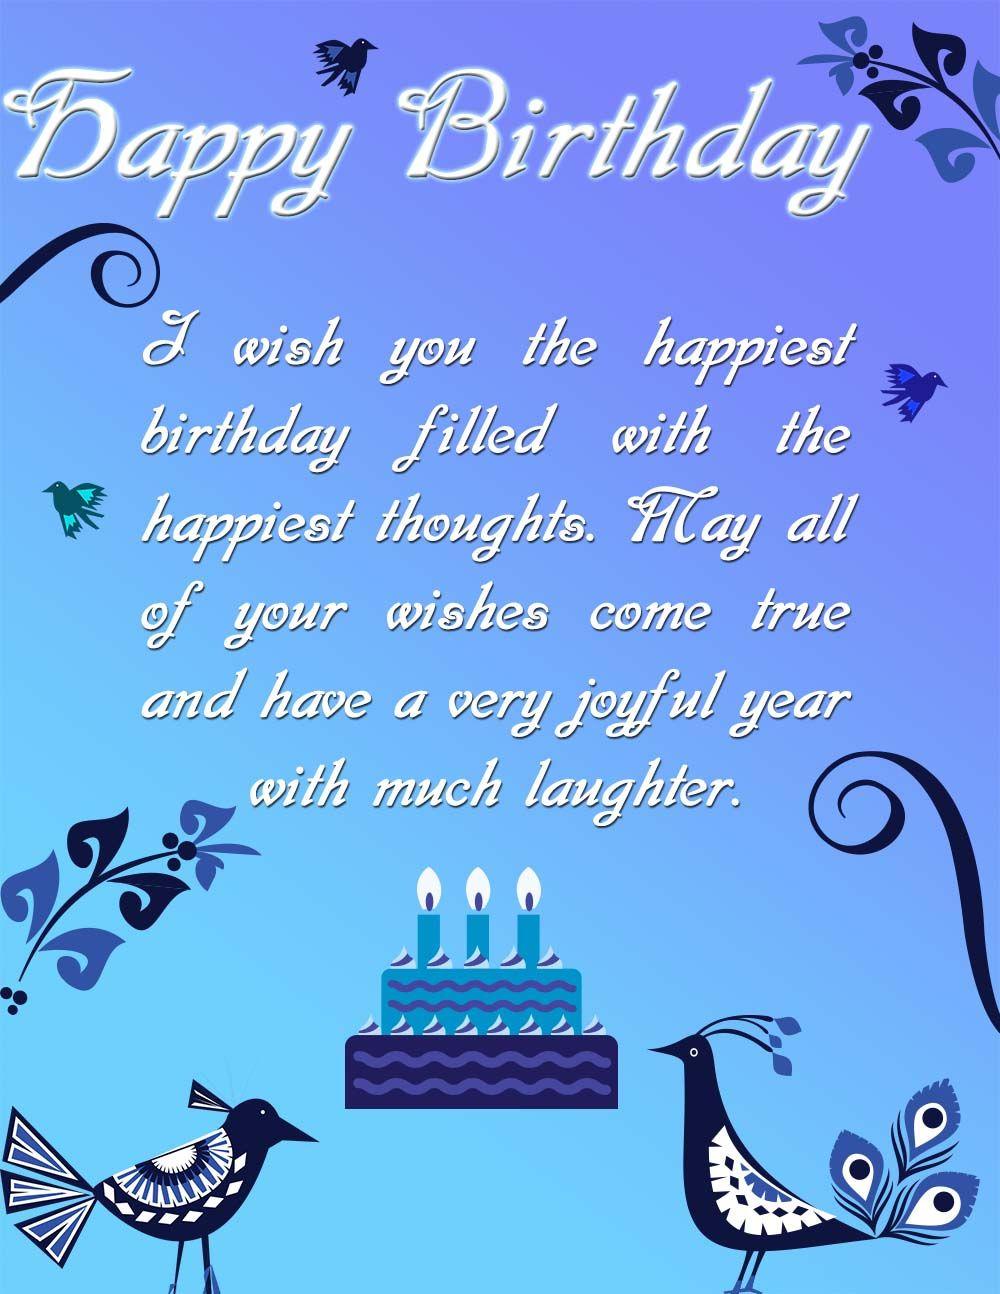 Happy Birthday Ecards Happy Birthday Ecard Birthday Greetings